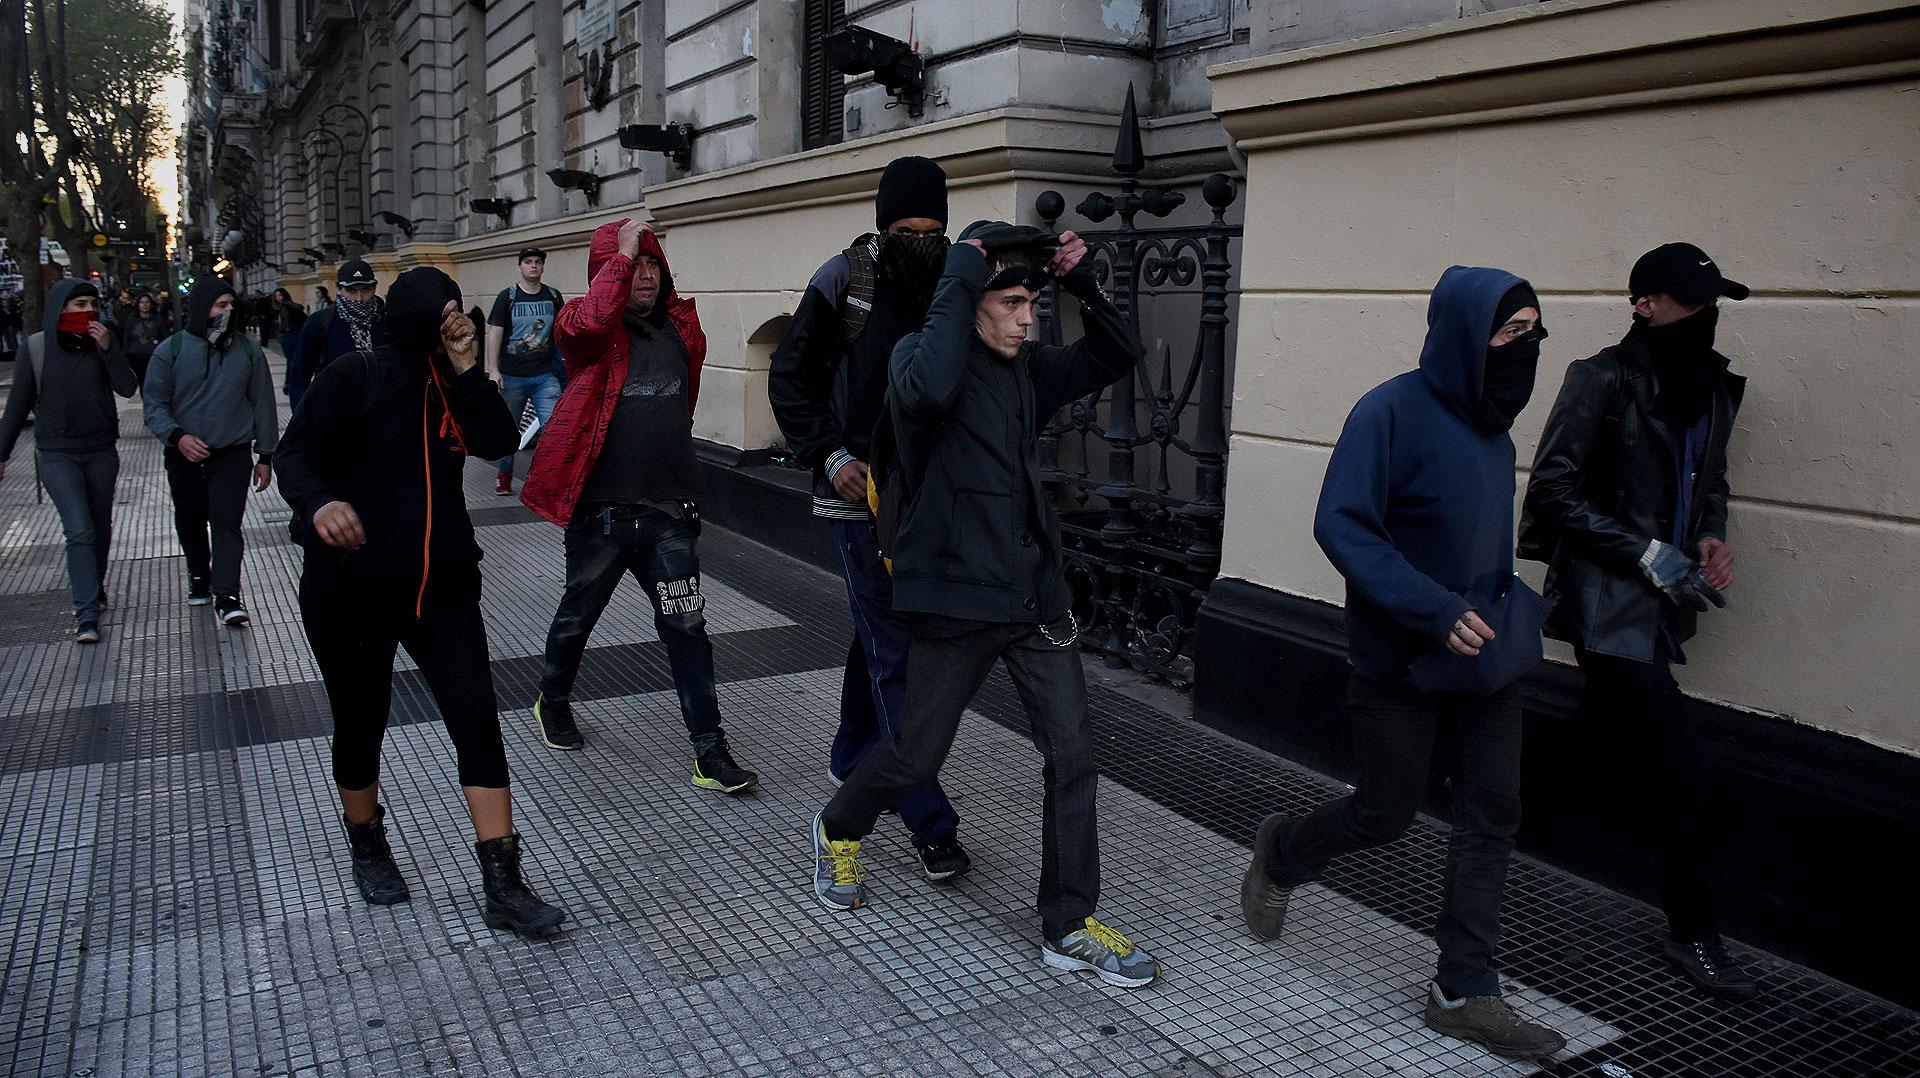 Encapuchados durante la marcha (foto Nicolás Stulberg)